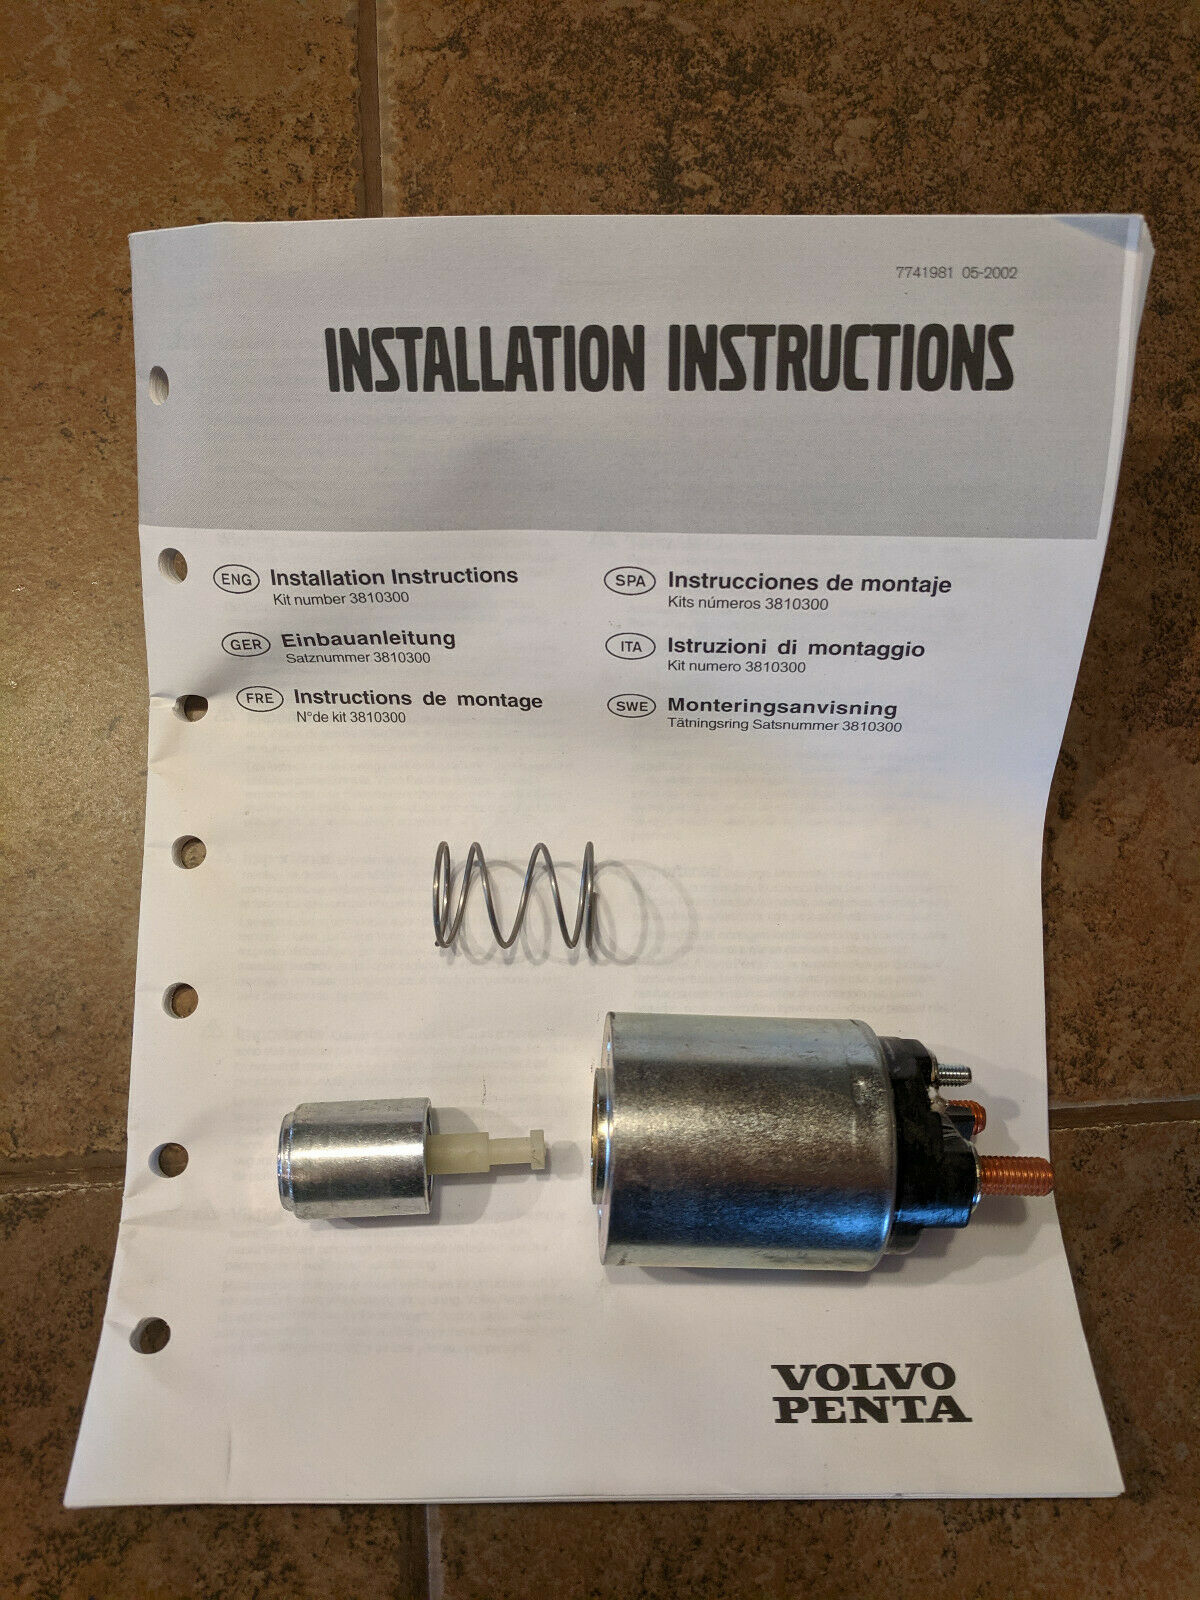 Genuine Volvo Penta Starter Solenoid Kit 3860606 3810300